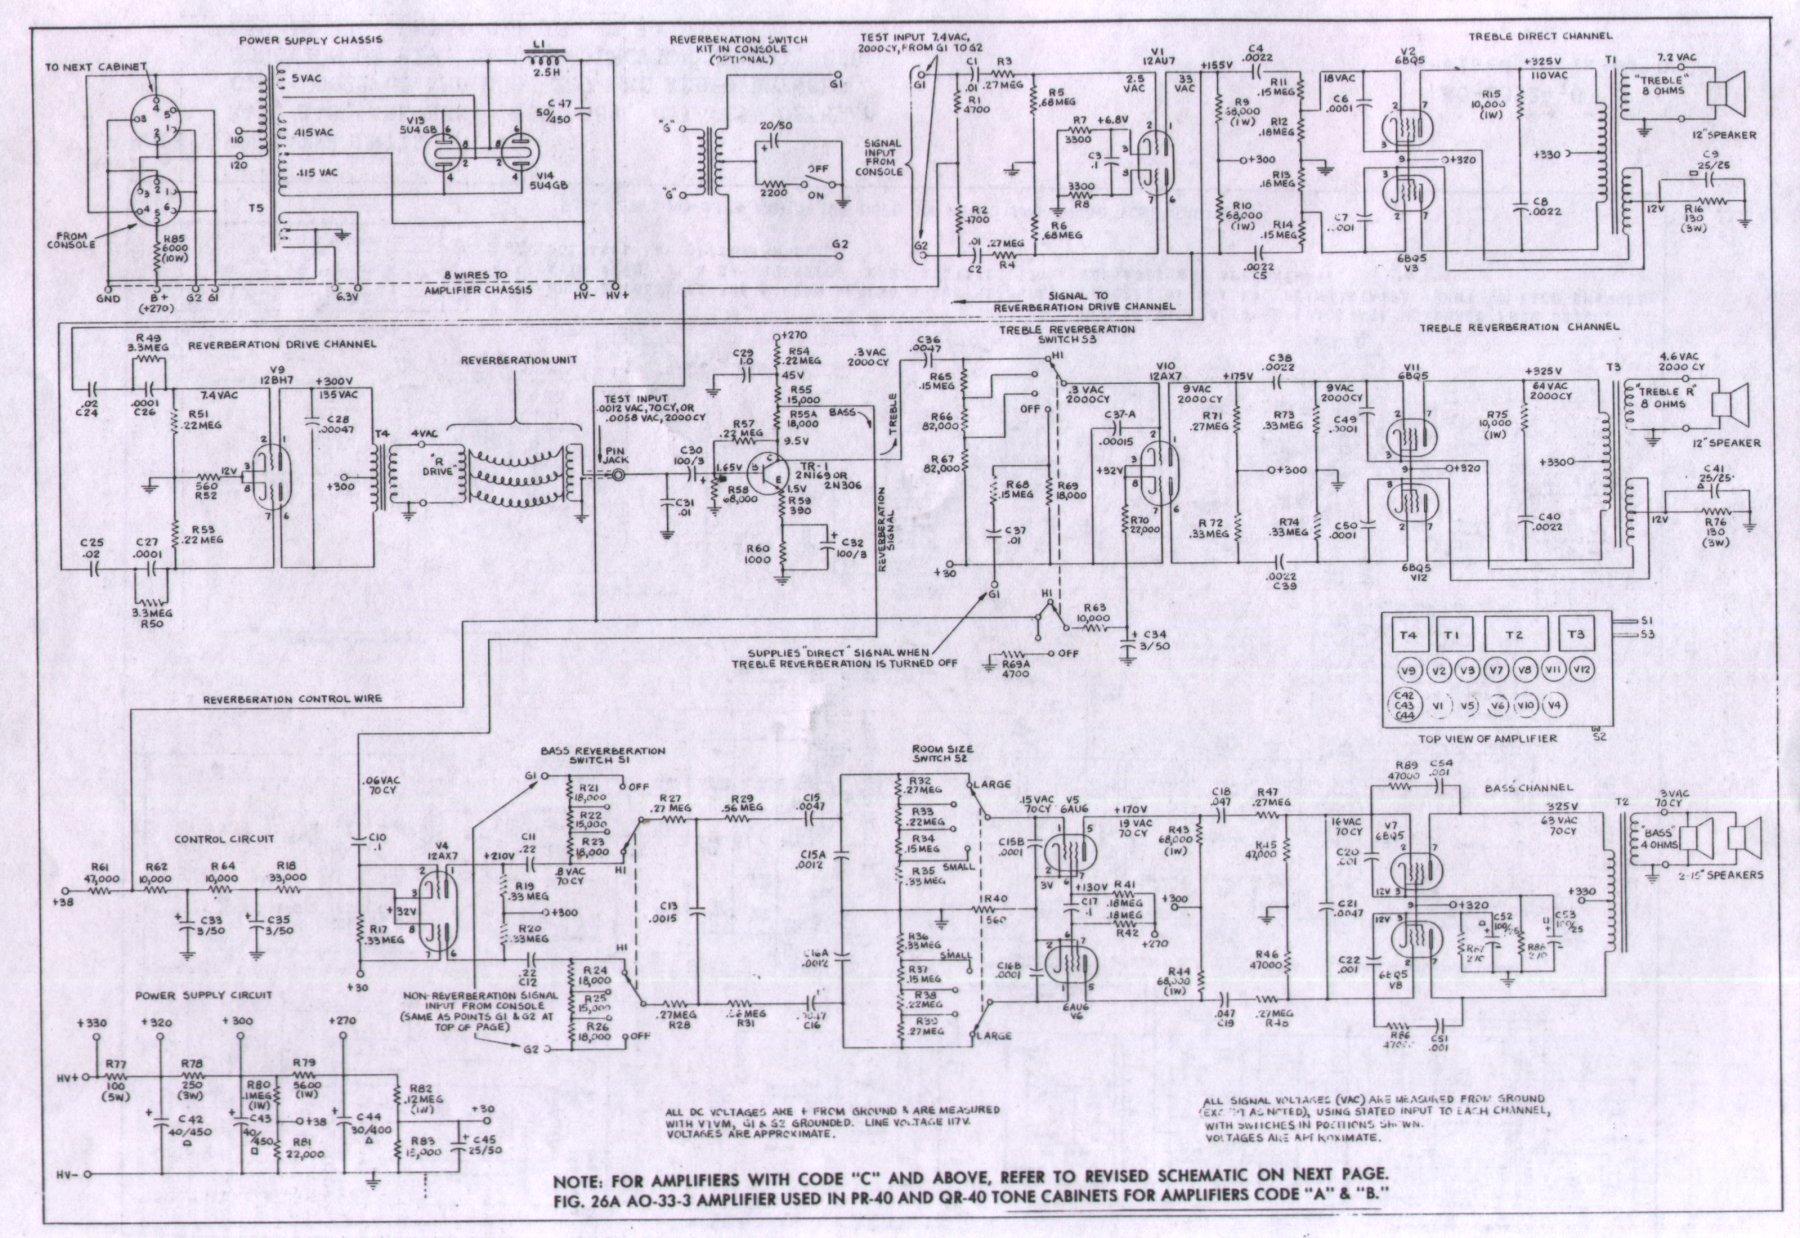 Dean Wiring Schematic - Simple Wirings on scott wiring diagram, washburn wiring diagram, jackson wiring diagram, murphy wiring diagram, emg wiring diagram, clark wiring diagram, marshall wiring diagram, warren wiring diagram, bill nash wiring diagram, yamaha wiring diagram, michael wiring diagram, squier wiring diagram, mitchell wiring diagram, gretsch wiring diagram, hunter wiring diagram, kyle wiring diagram, epiphone wiring diagram, gibson sg wiring diagram, harley wiring diagram, dixon wiring diagram,